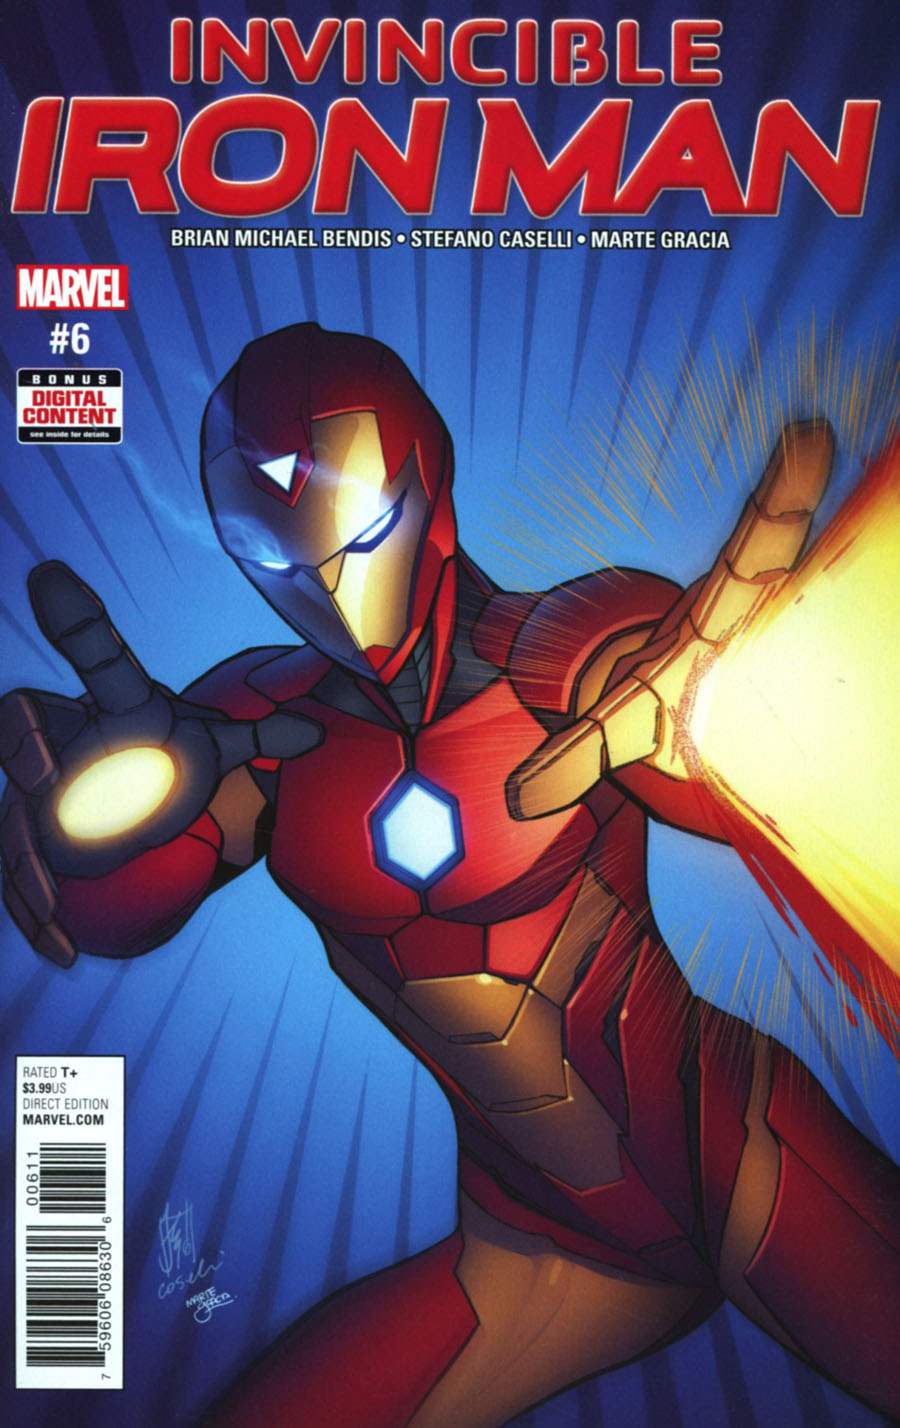 Invincible Iron Man Vol 3 #6 Cover A Regular Stefano Caselli Cover